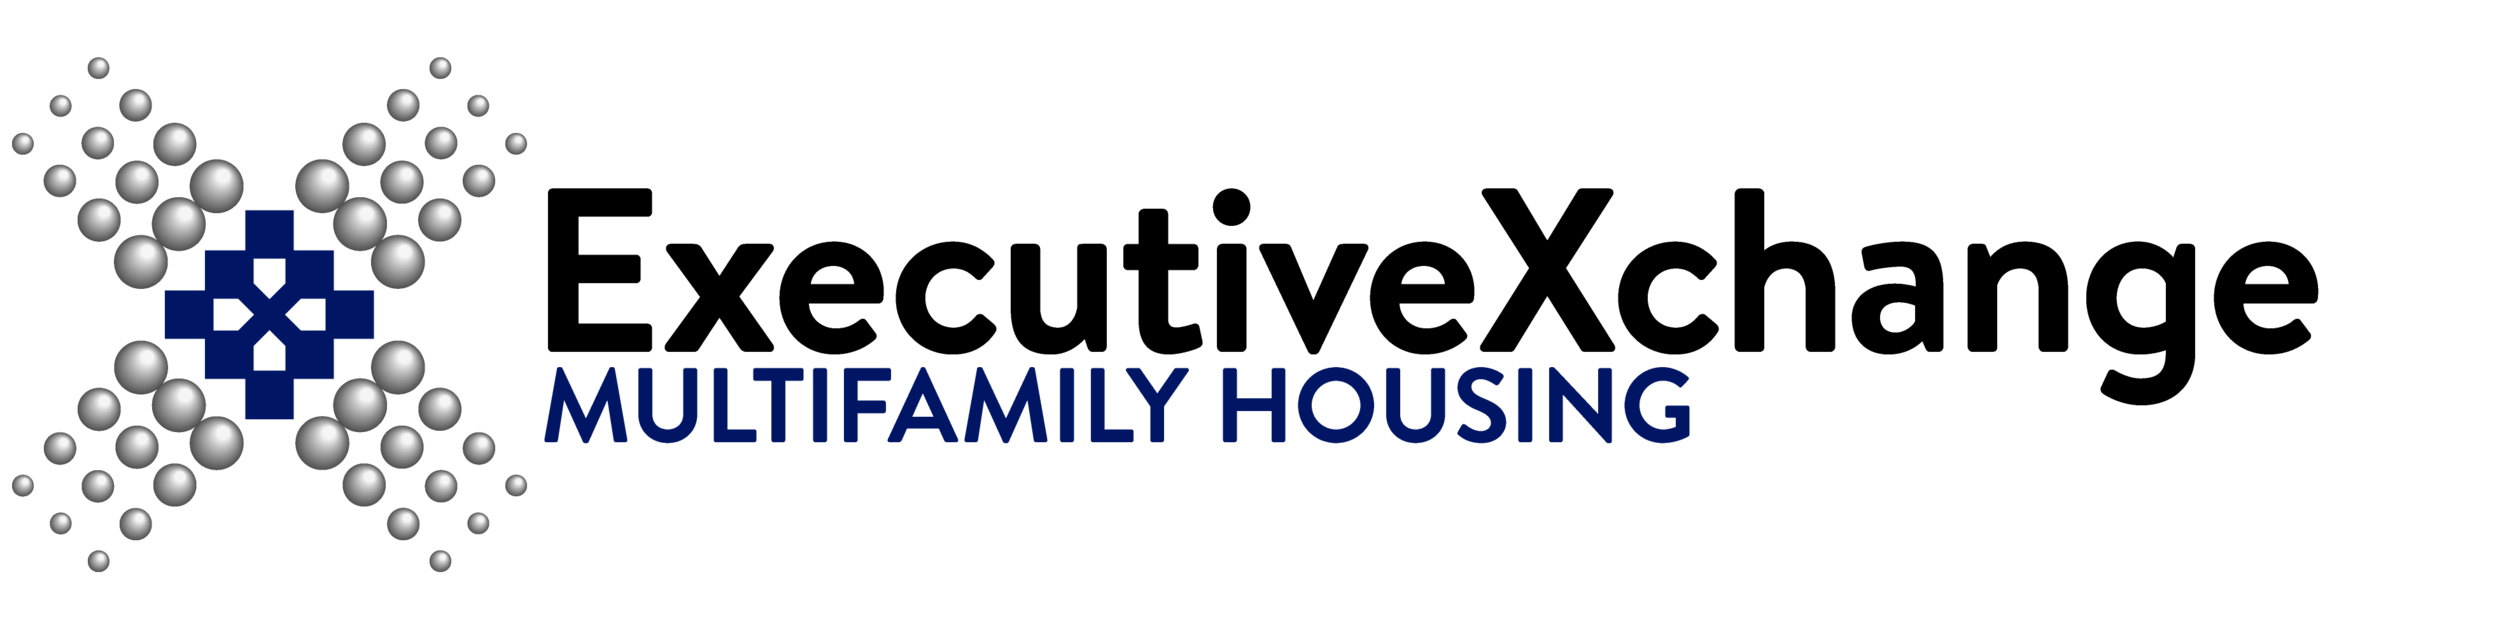 ExecutiveXchange Multifamily Housing-01.png